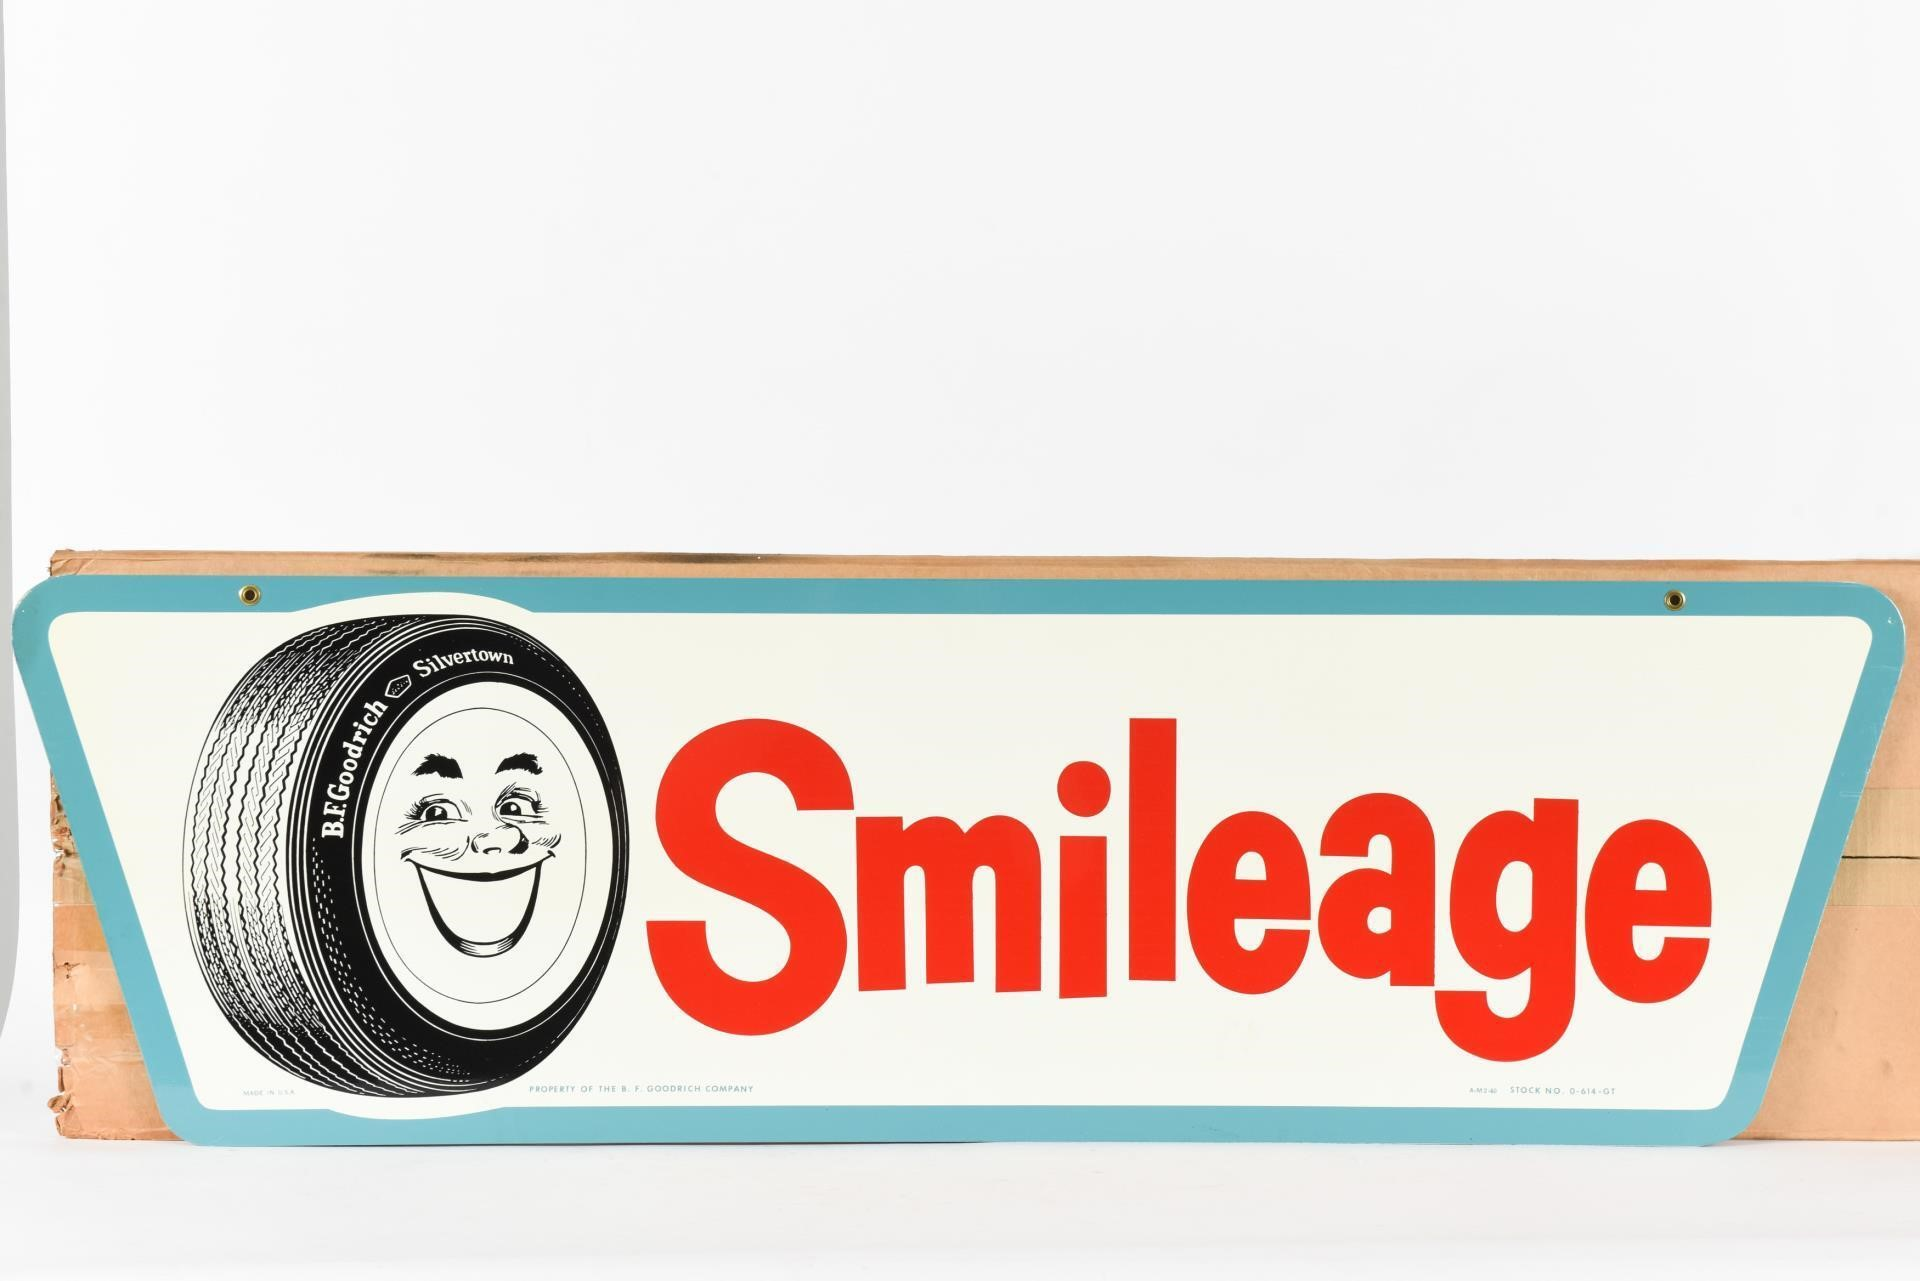 RARE 1960 B.F. GOODRICH SMILEAGE D/S METAL SIGN